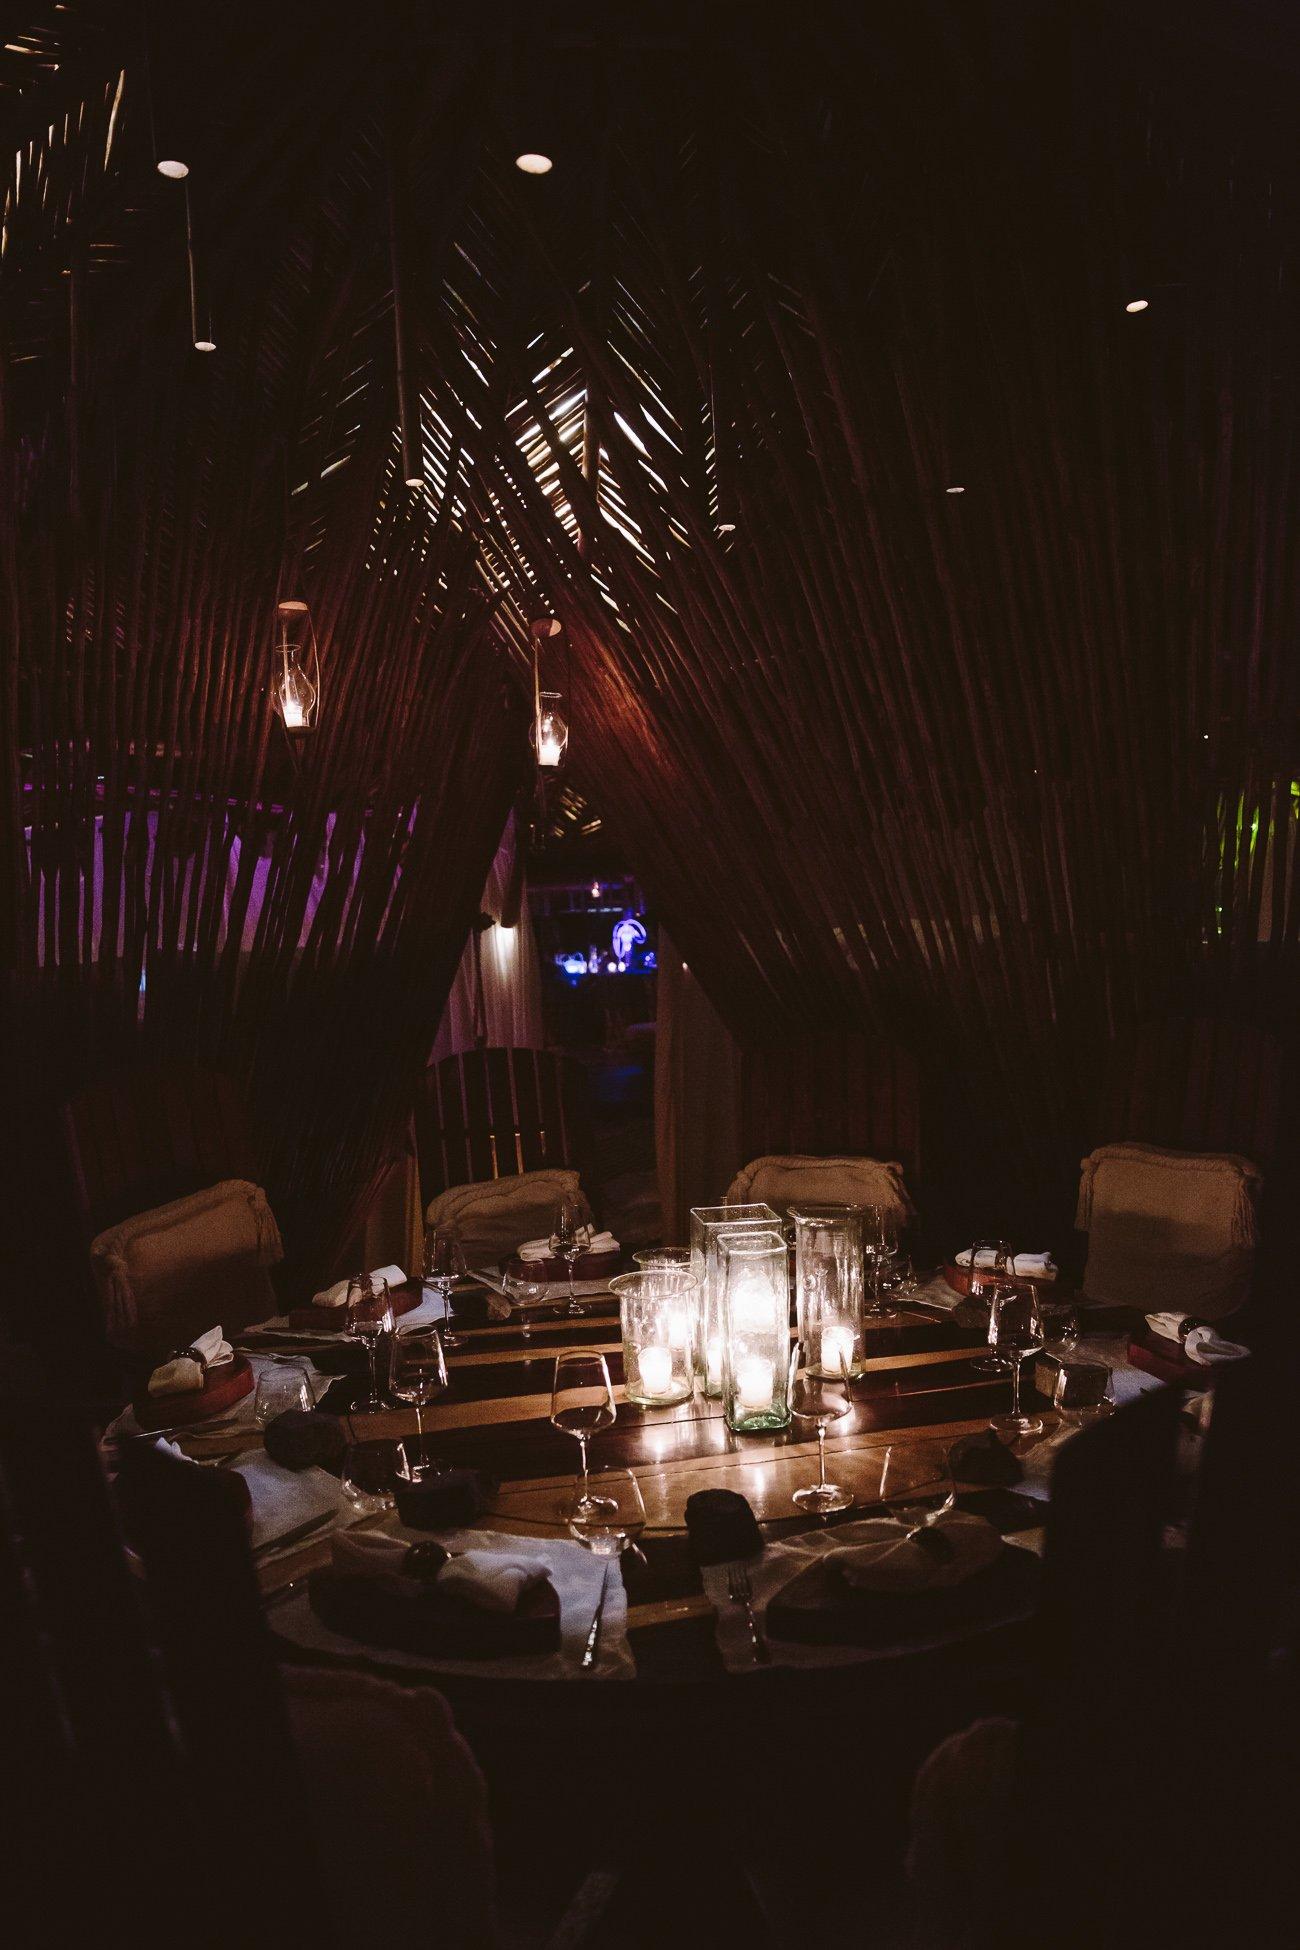 Kin Toh Restaurant Tulum Mexico